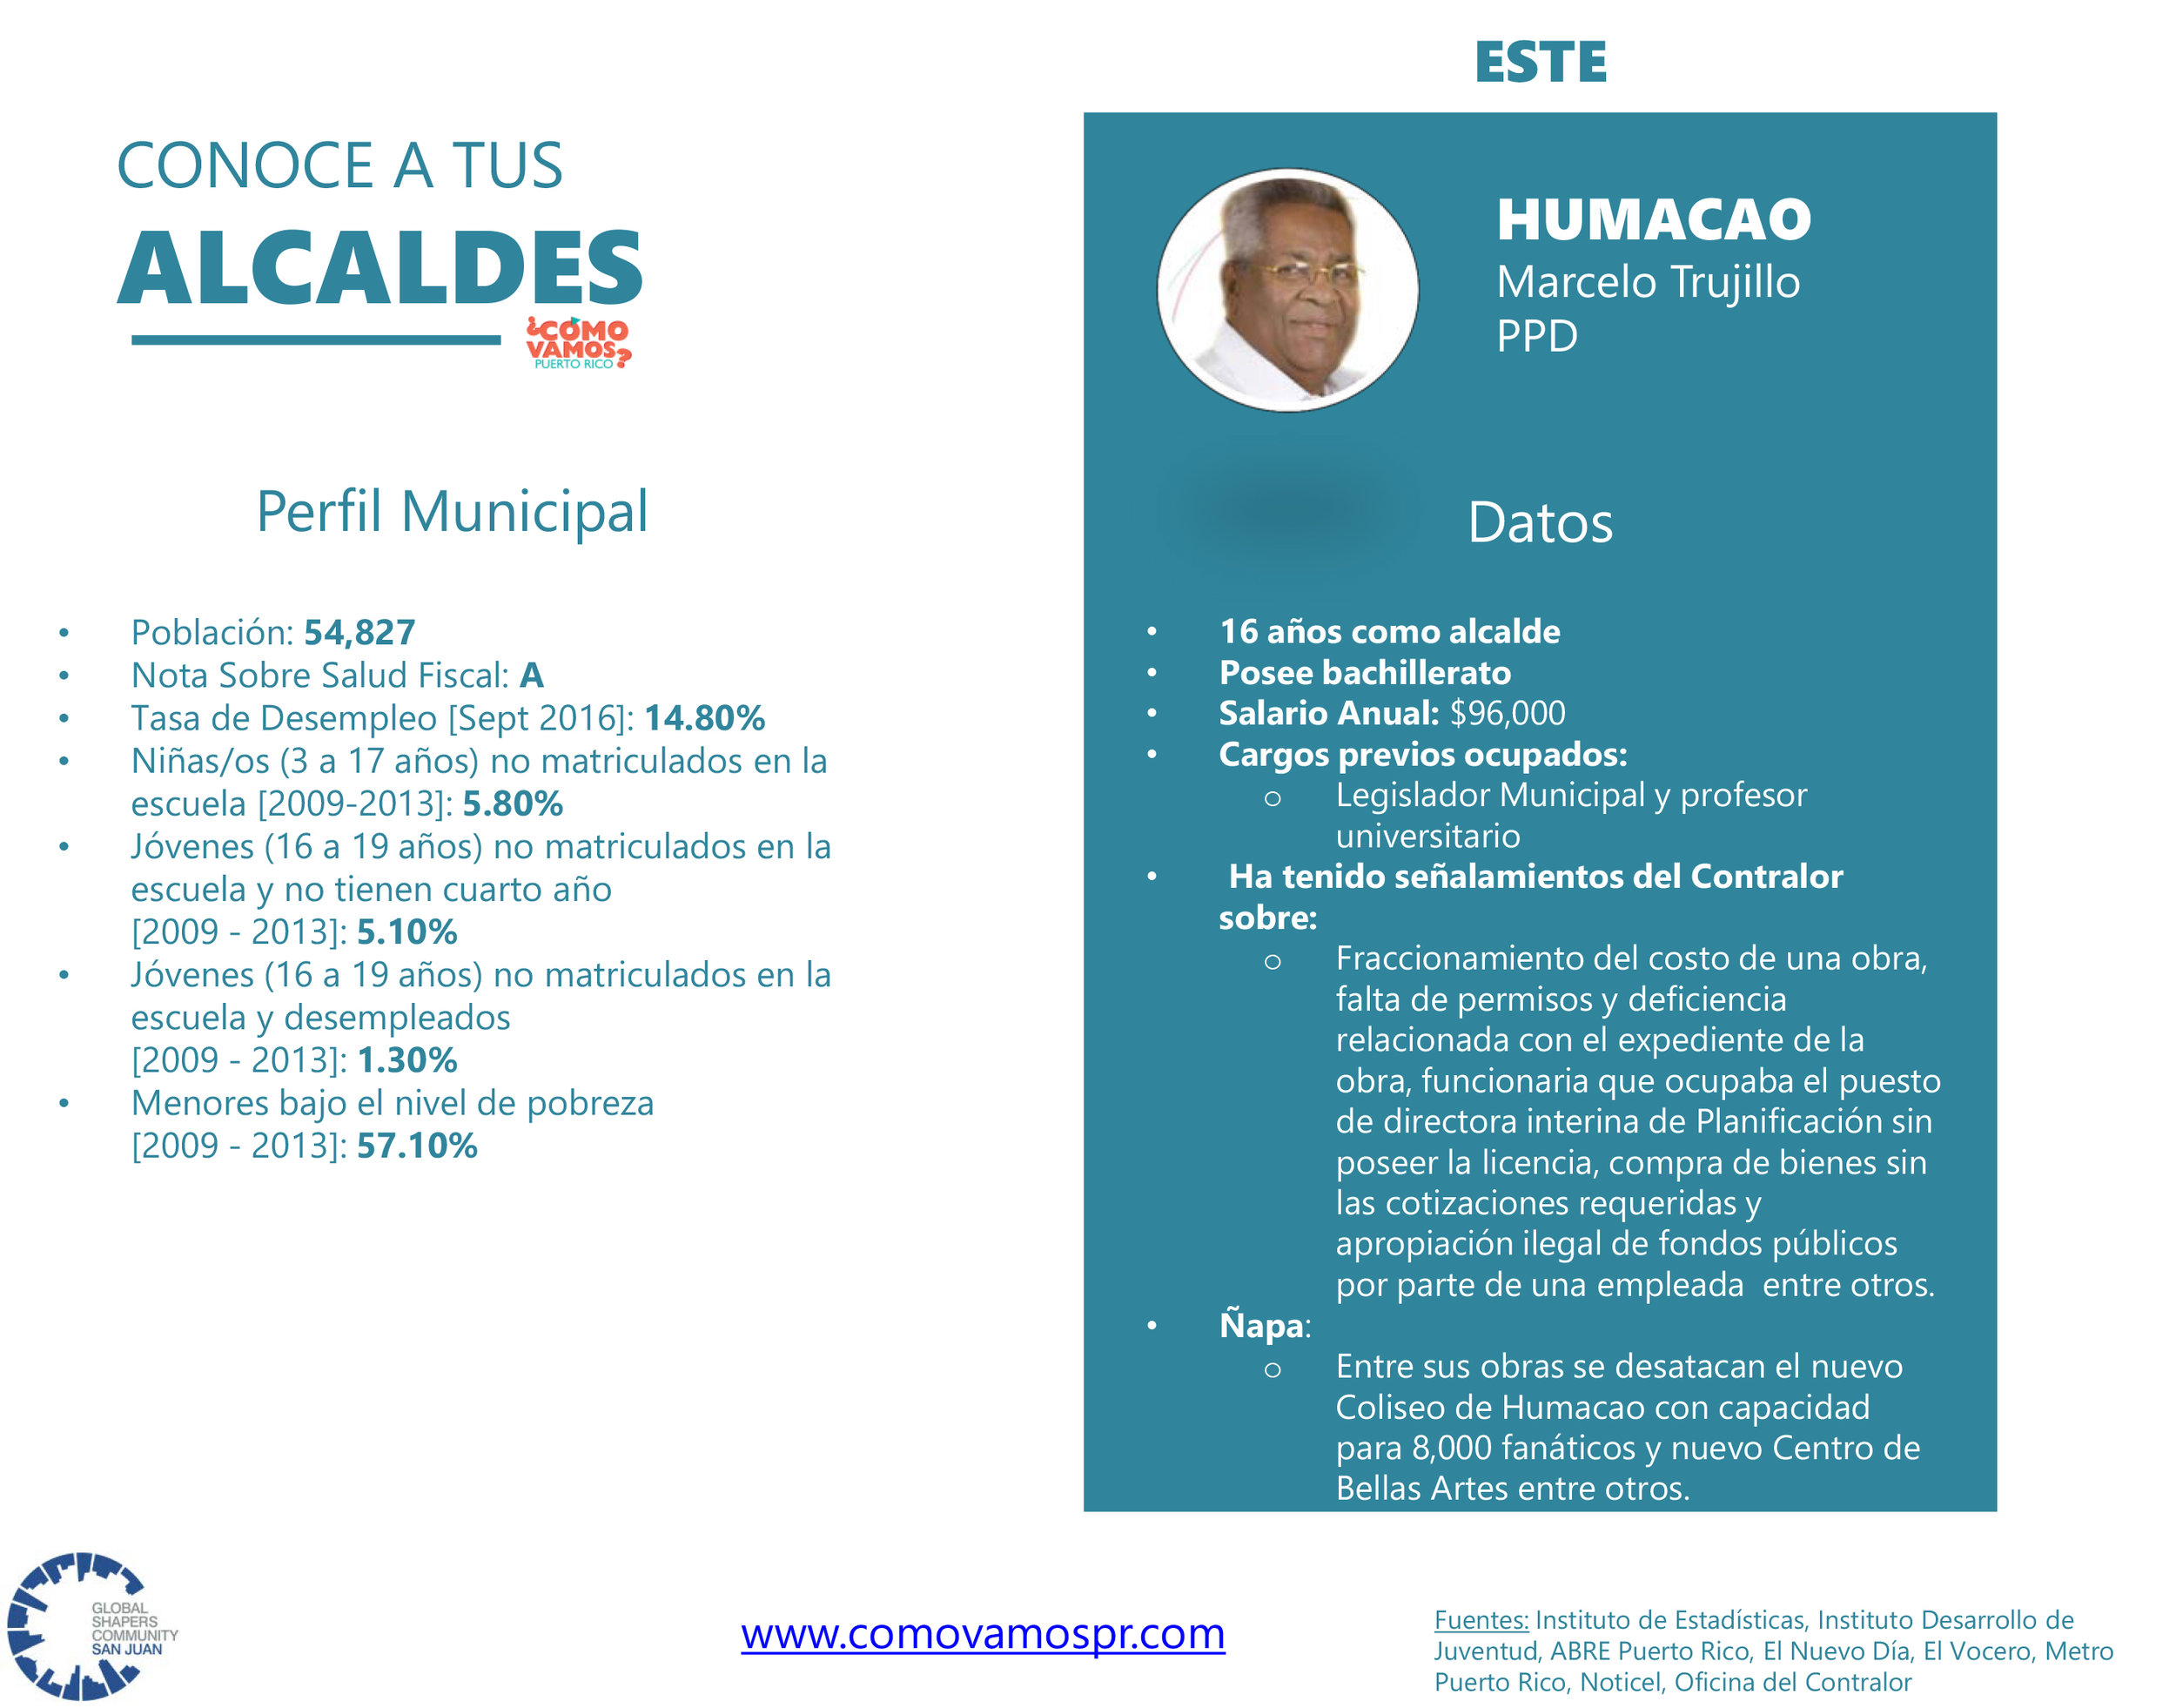 Alcaldes_Este_Humacao.jpg